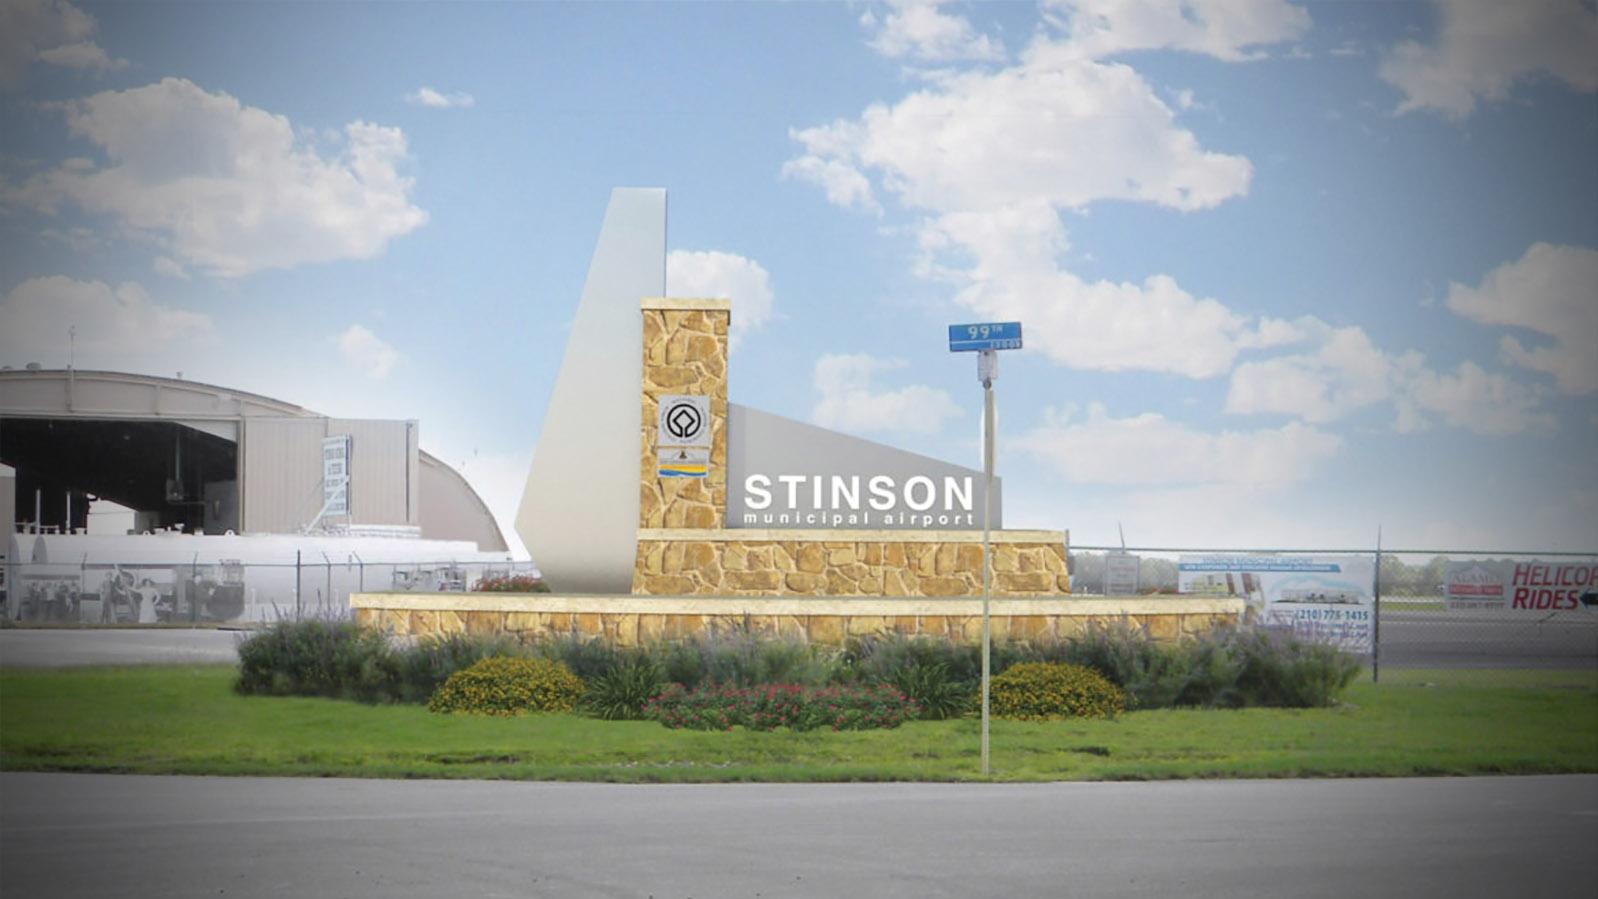 StinsonSignage.jpg